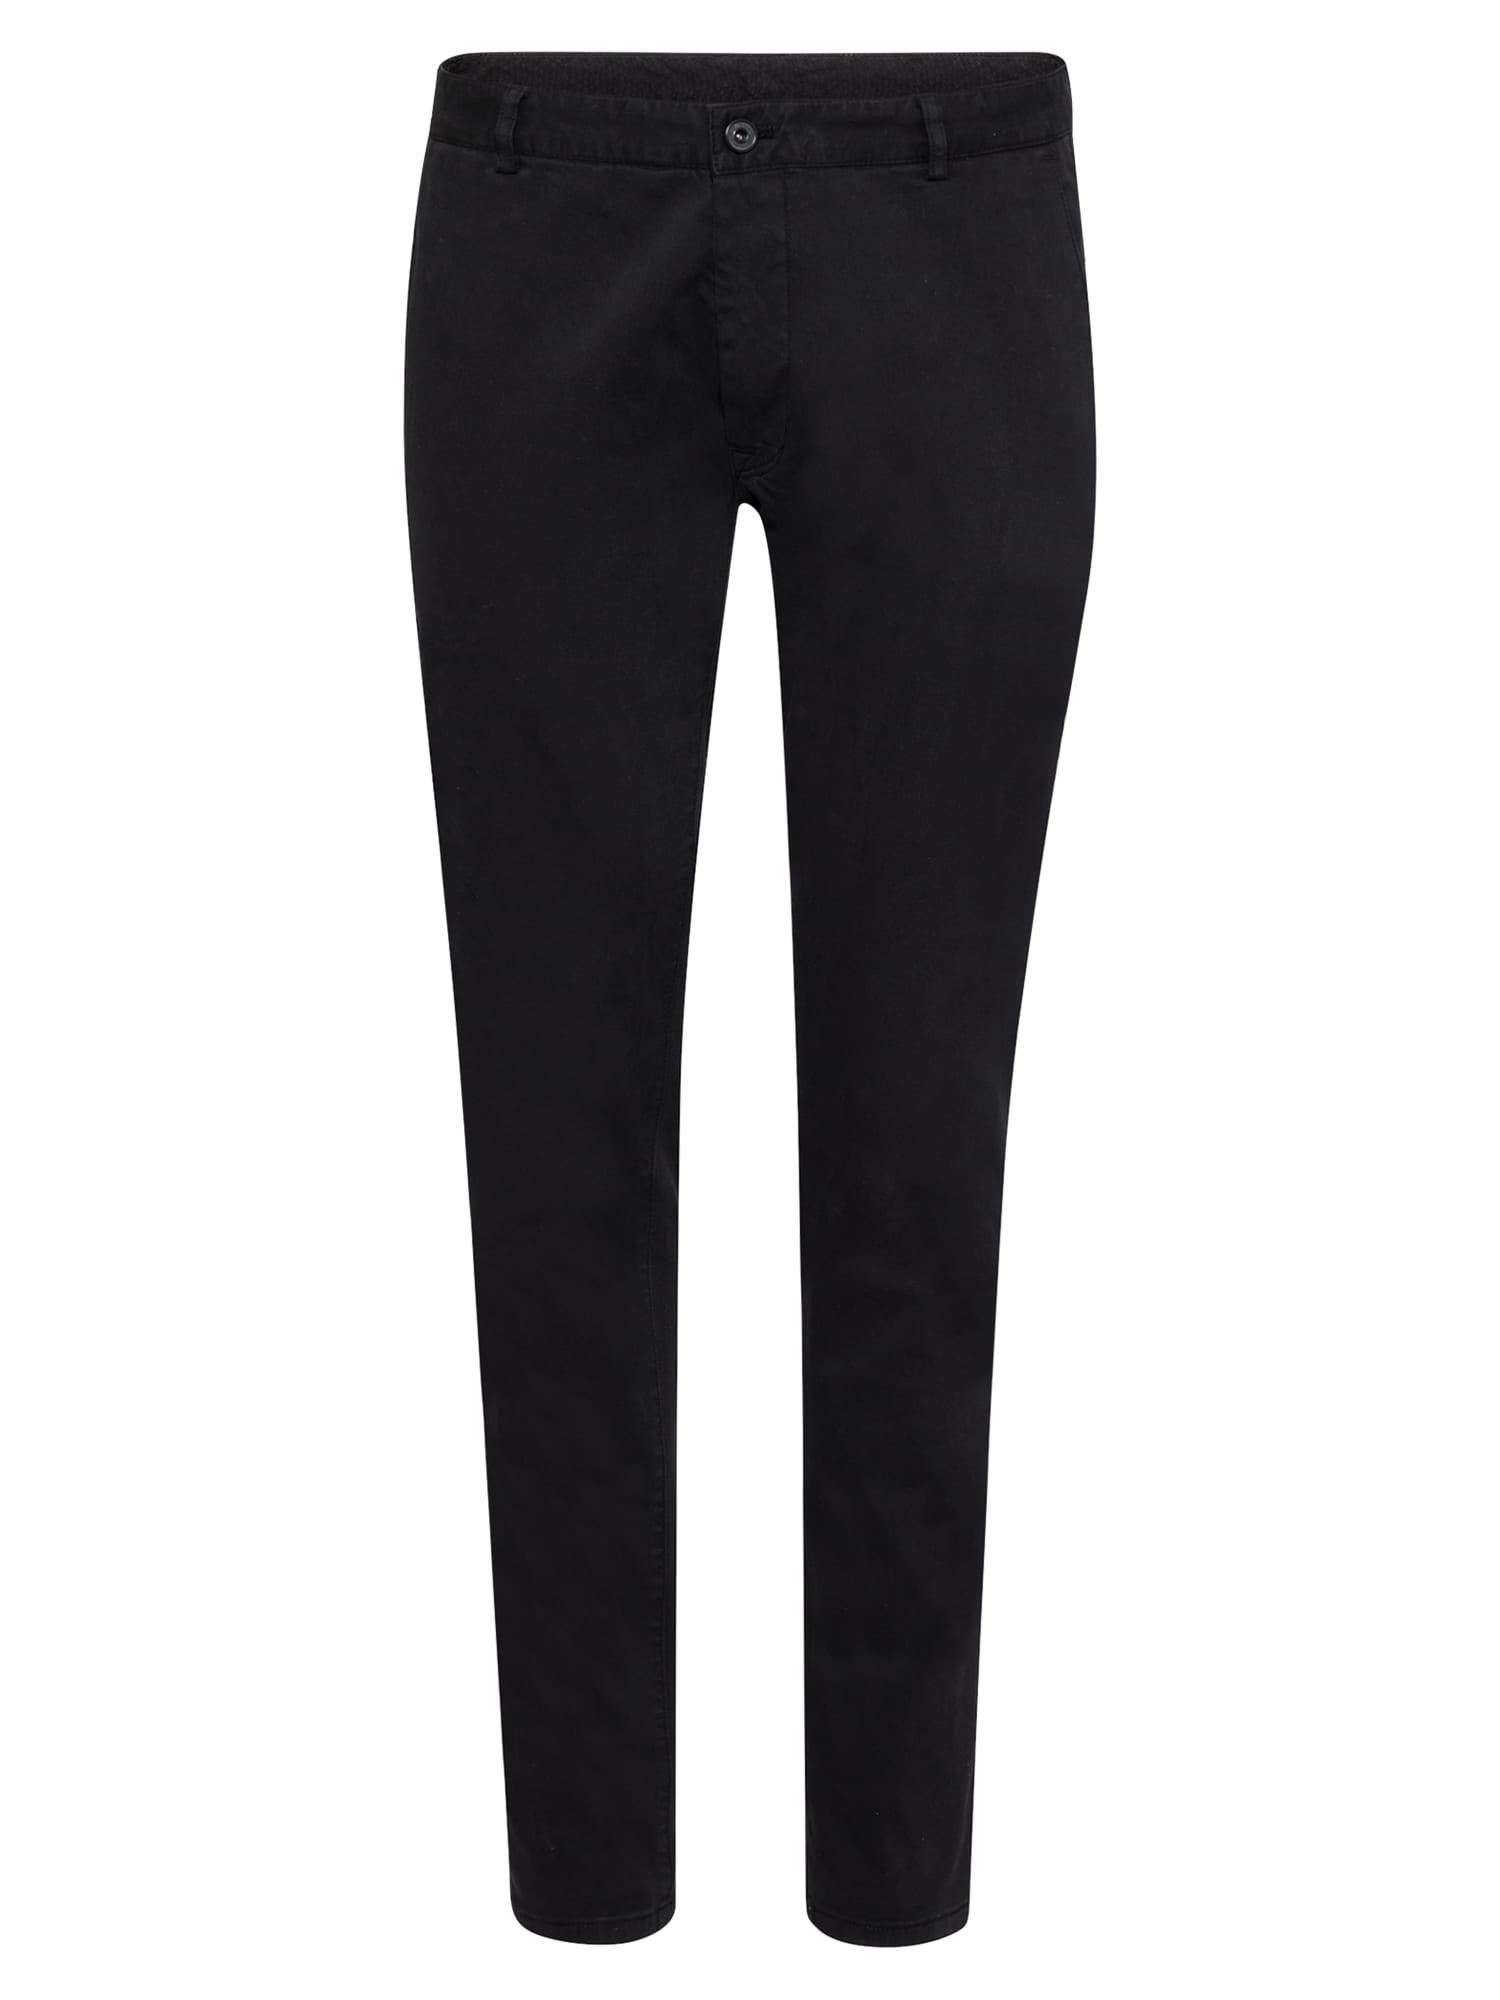 Tiger of Sweden Pantalon 'TRANSIT 4.'  - Noir - Taille: 50 - male